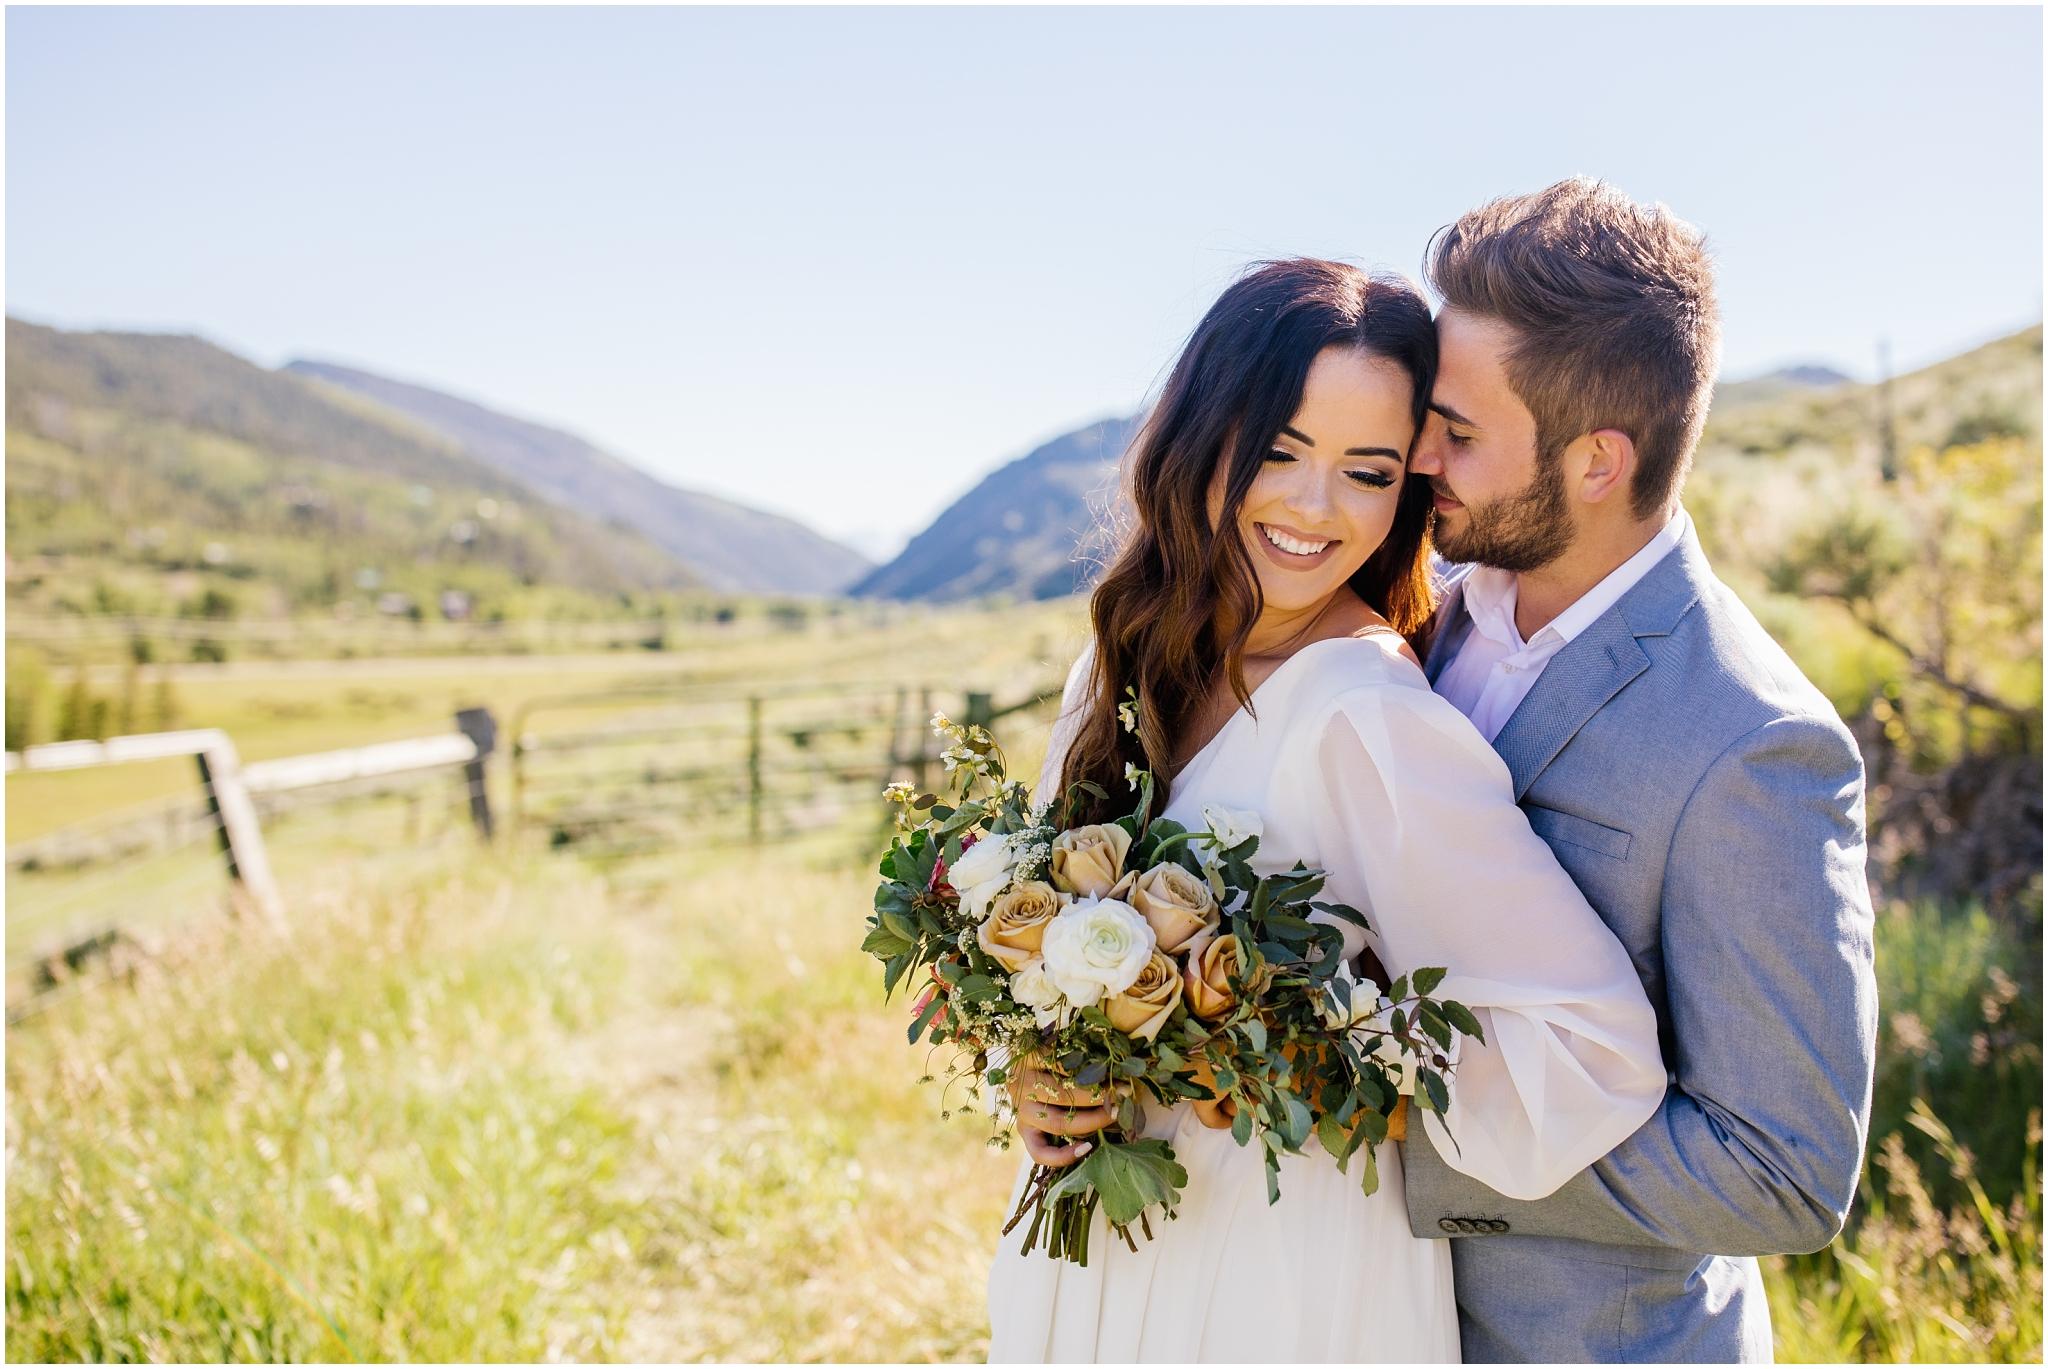 MountainShoot-36_Lizzie-B-Imagery-Utah-Wedding-Photographer-Salt-Lake-City-Park-City-Utah-County.jpg